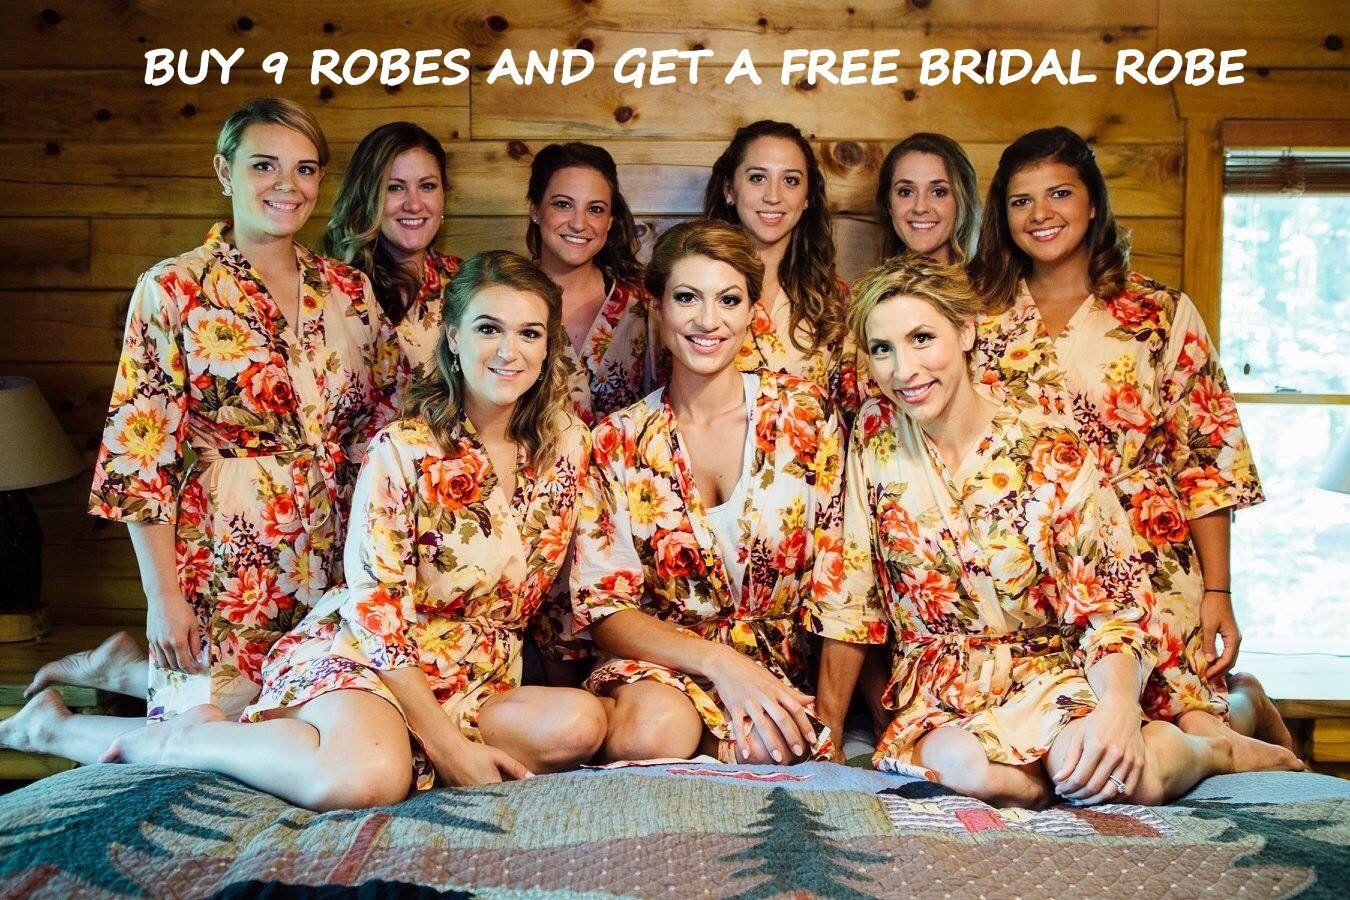 Bridesmaid Robes Set Of 10 Free Bridal Robe Floral Robes Uk Robe Demoiselle D Honneur Coton Bridesmaid Robes Canada Brautjungfer Roben Bridesmaid Robes Cotton Bridesmaid Robes Flower Girl Robes